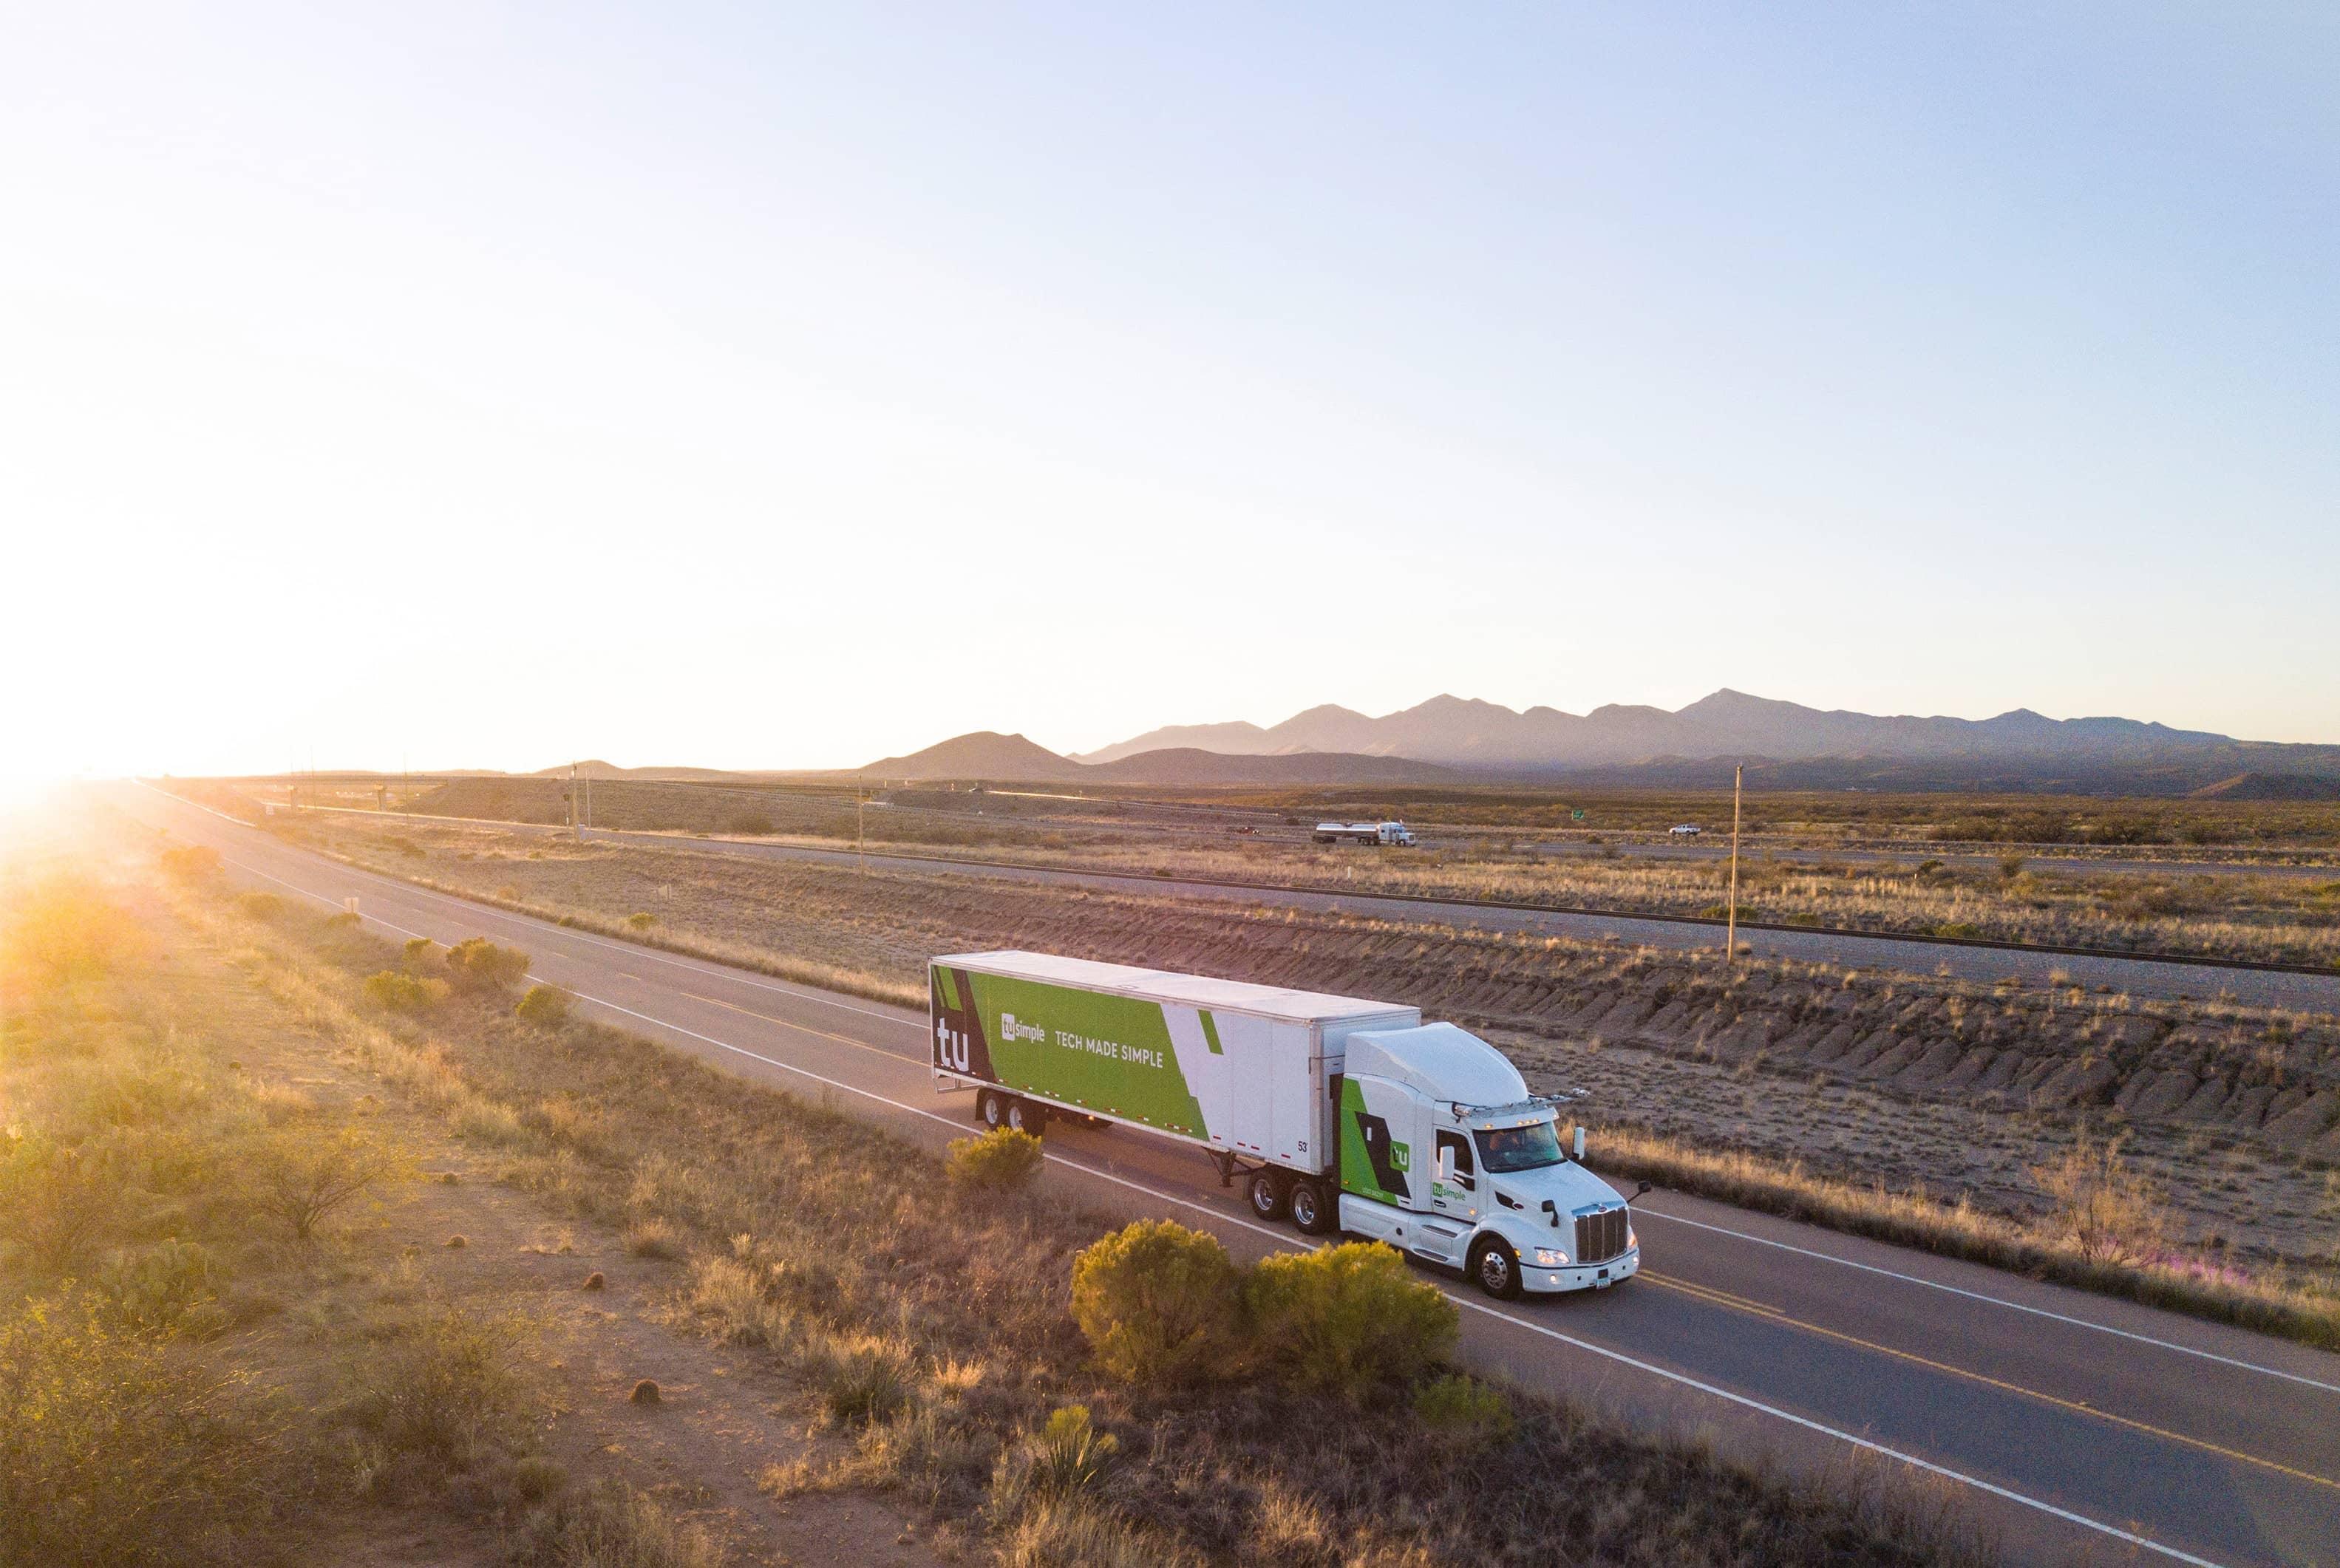 Postal Service Tests Mail Shipments On Self-Driving Trucks